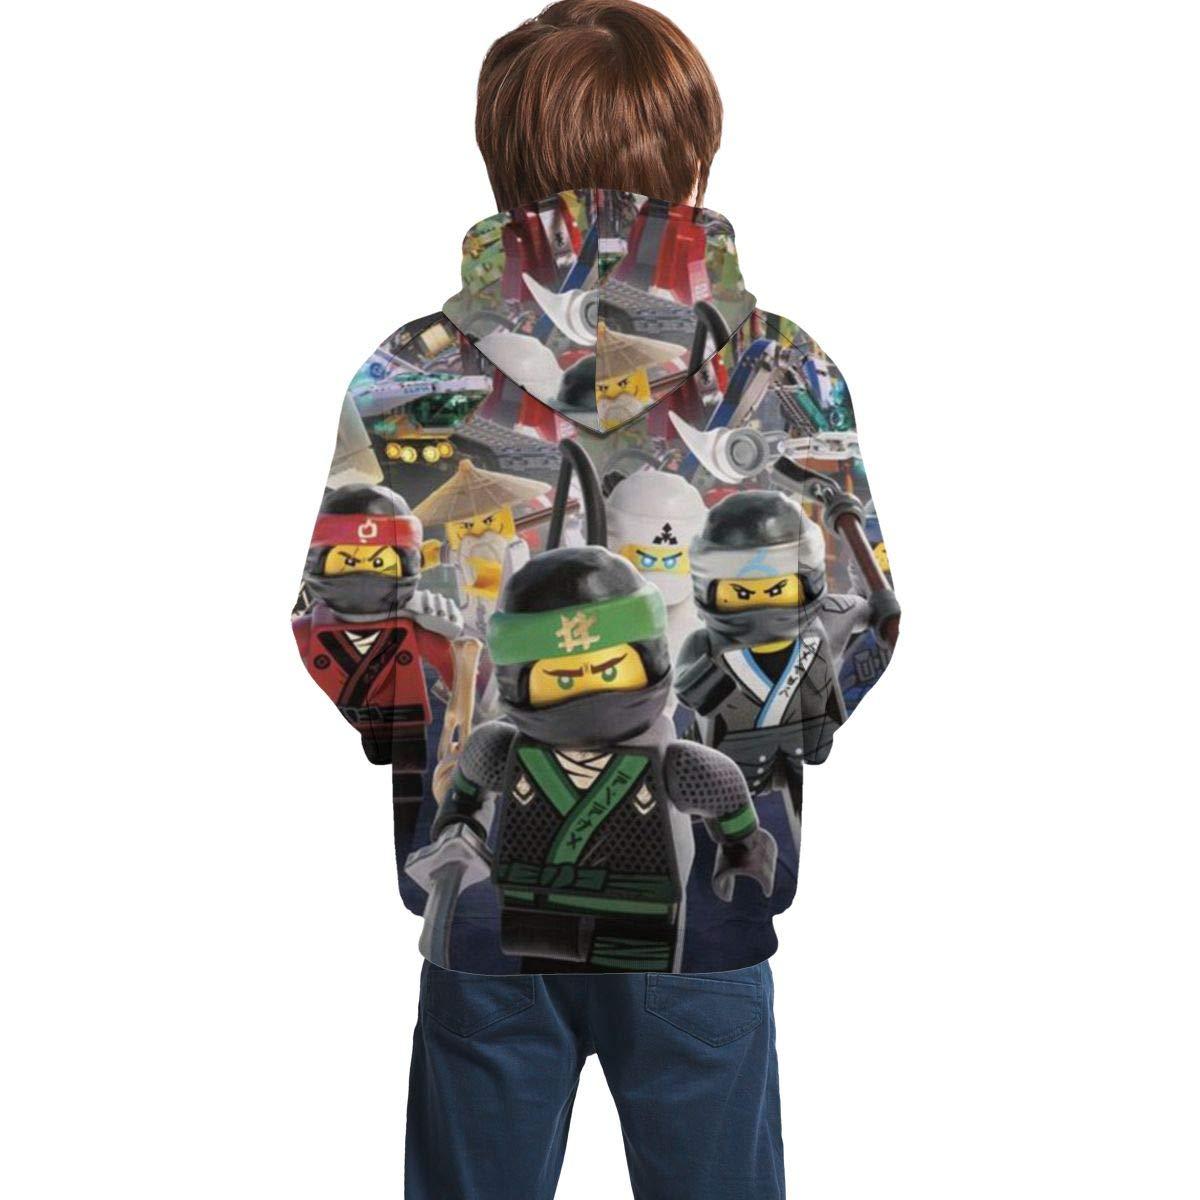 Owen Wilkins Childrens Hoodies Ninja-Go Hooded Sweatshirt Unisex Pocket Hooded Sweatshirts for Boys/Girls/Teen/Kids